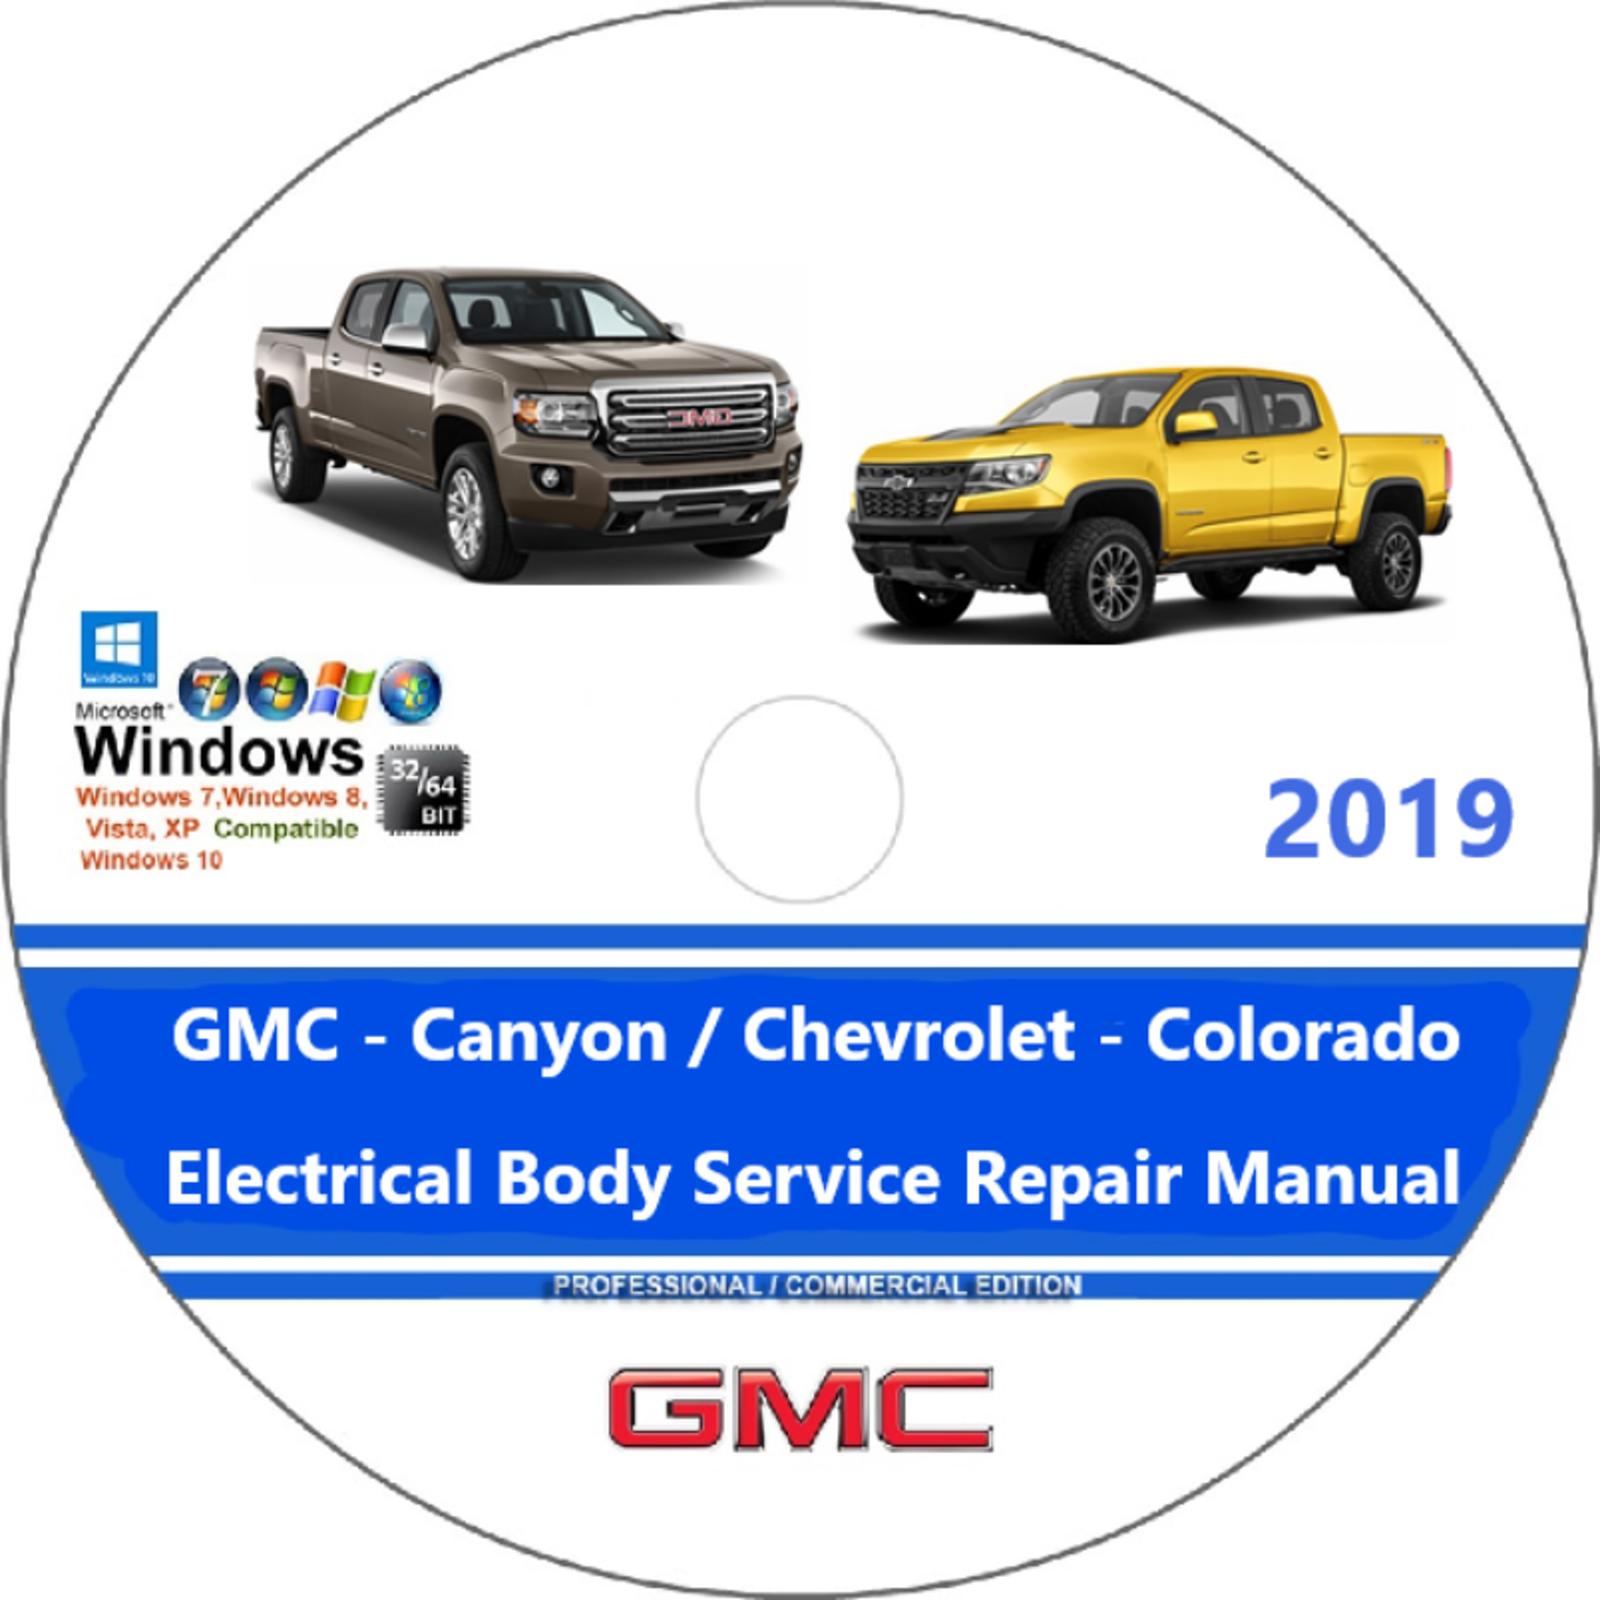 Gmc Service Manual Pdf